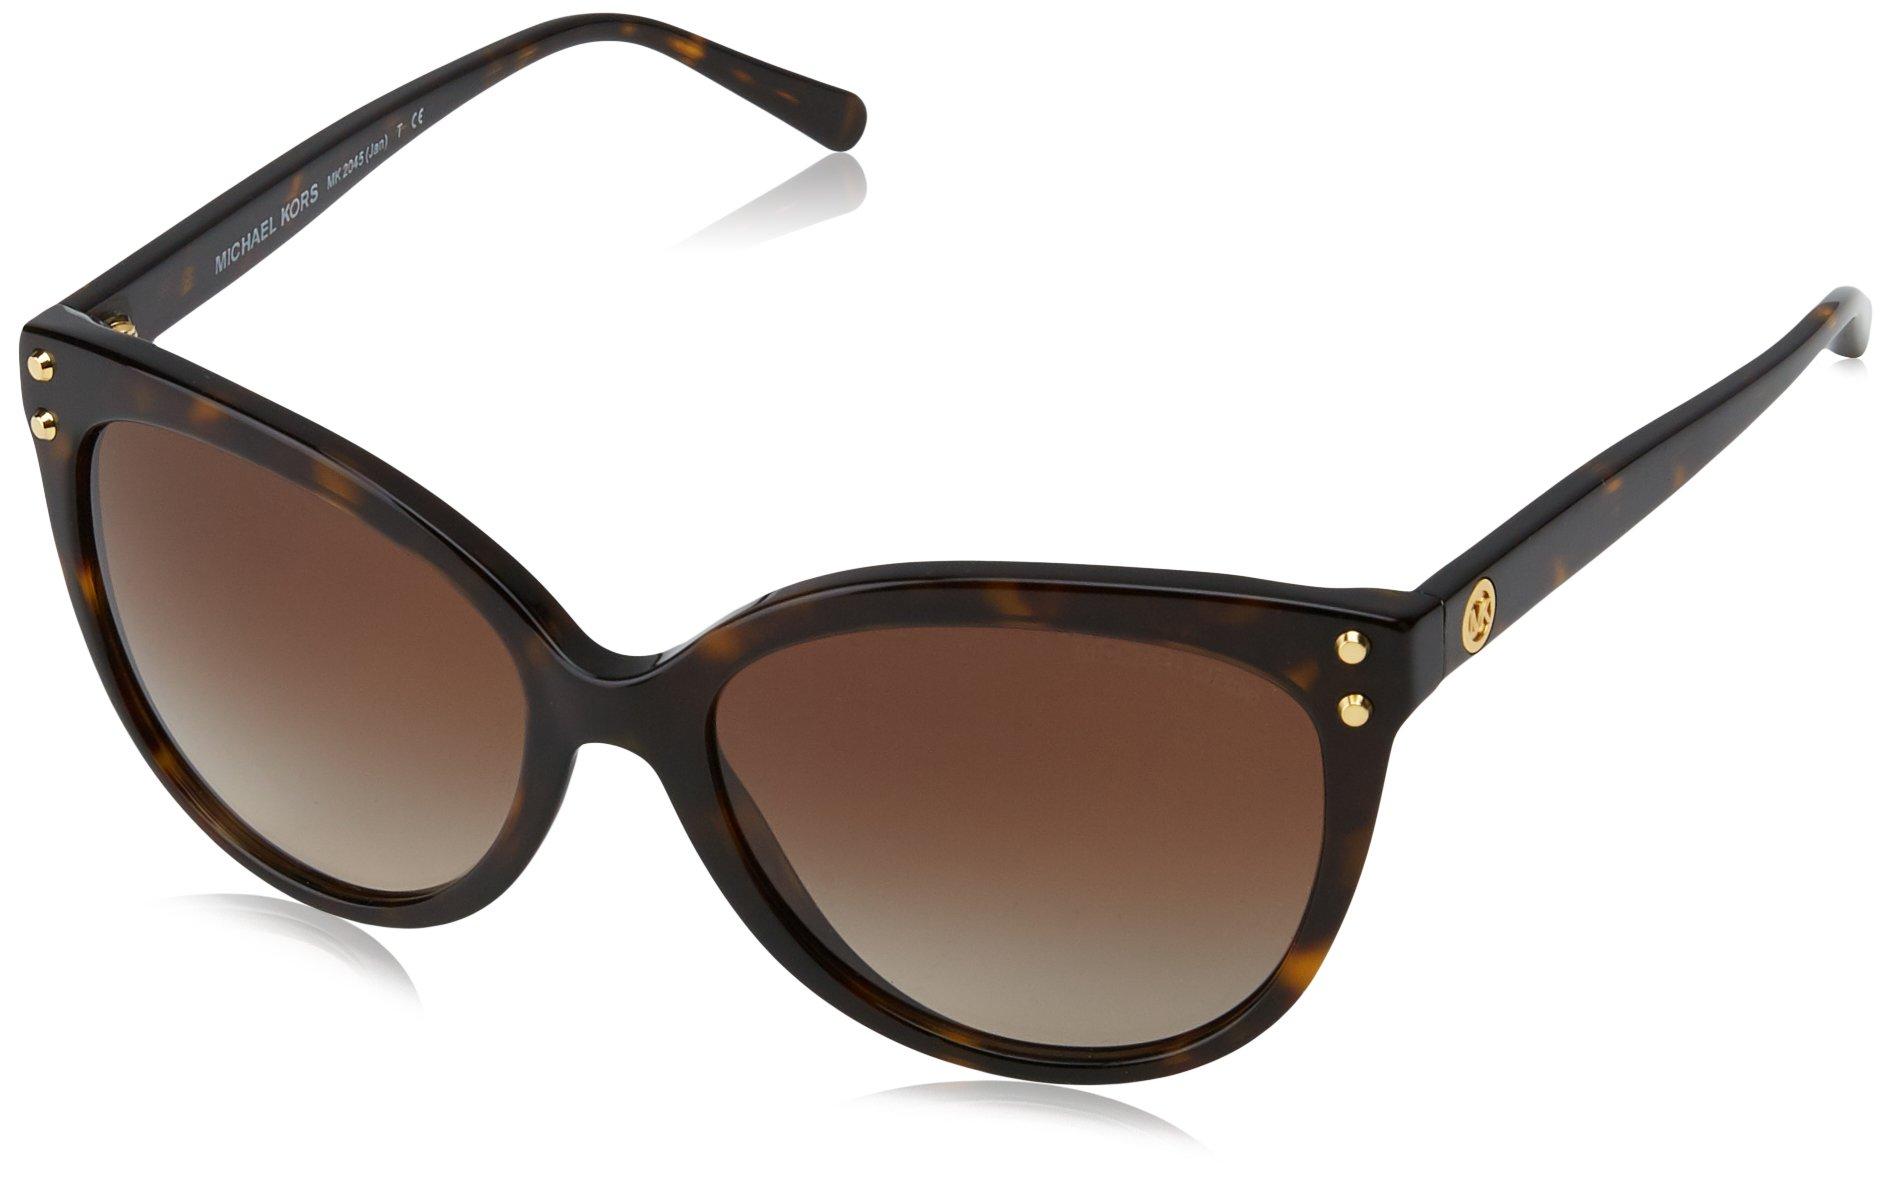 Michael Kors Women's Jan MK2045 55mm Dark Tortoise Acetate/Brown Gradient Sunglasses